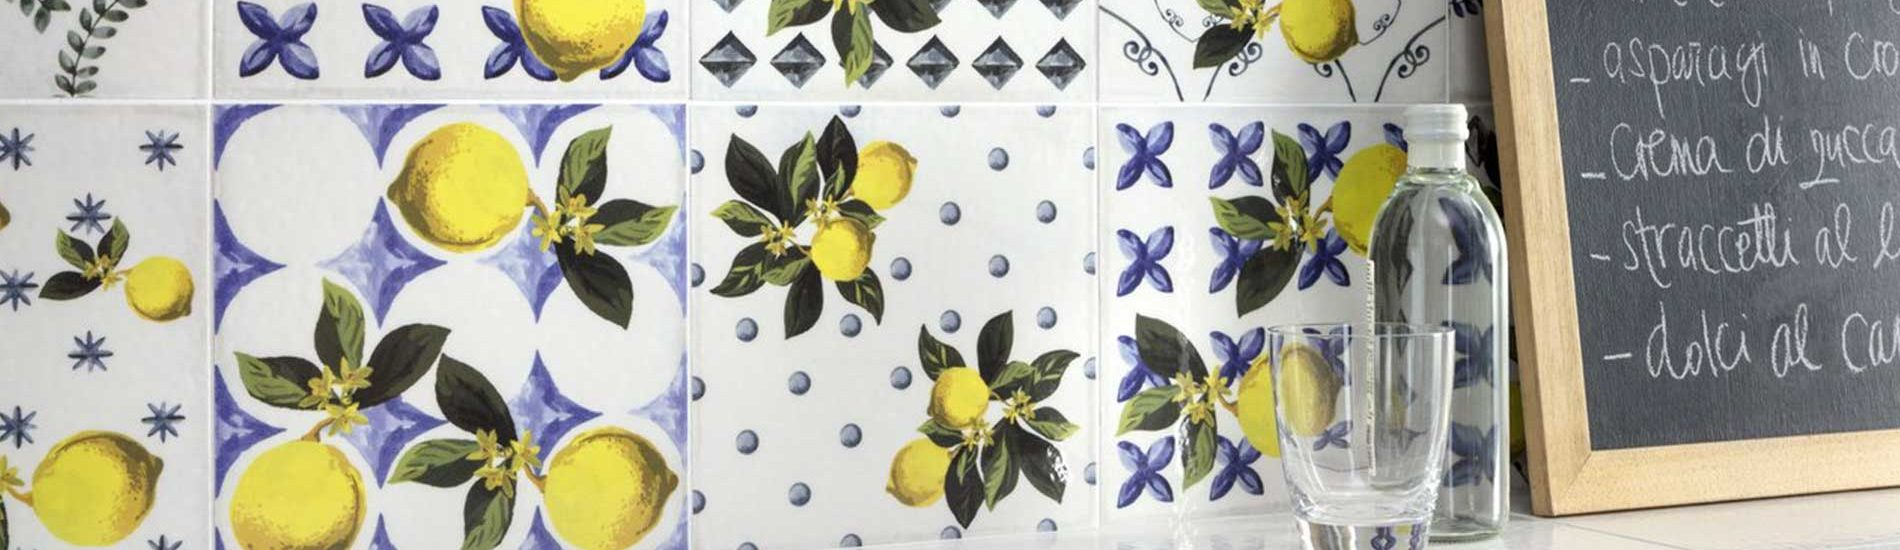 banner-vita-italian-cement-look-floor-wall-tile-ceramica-santagostino-anaheim